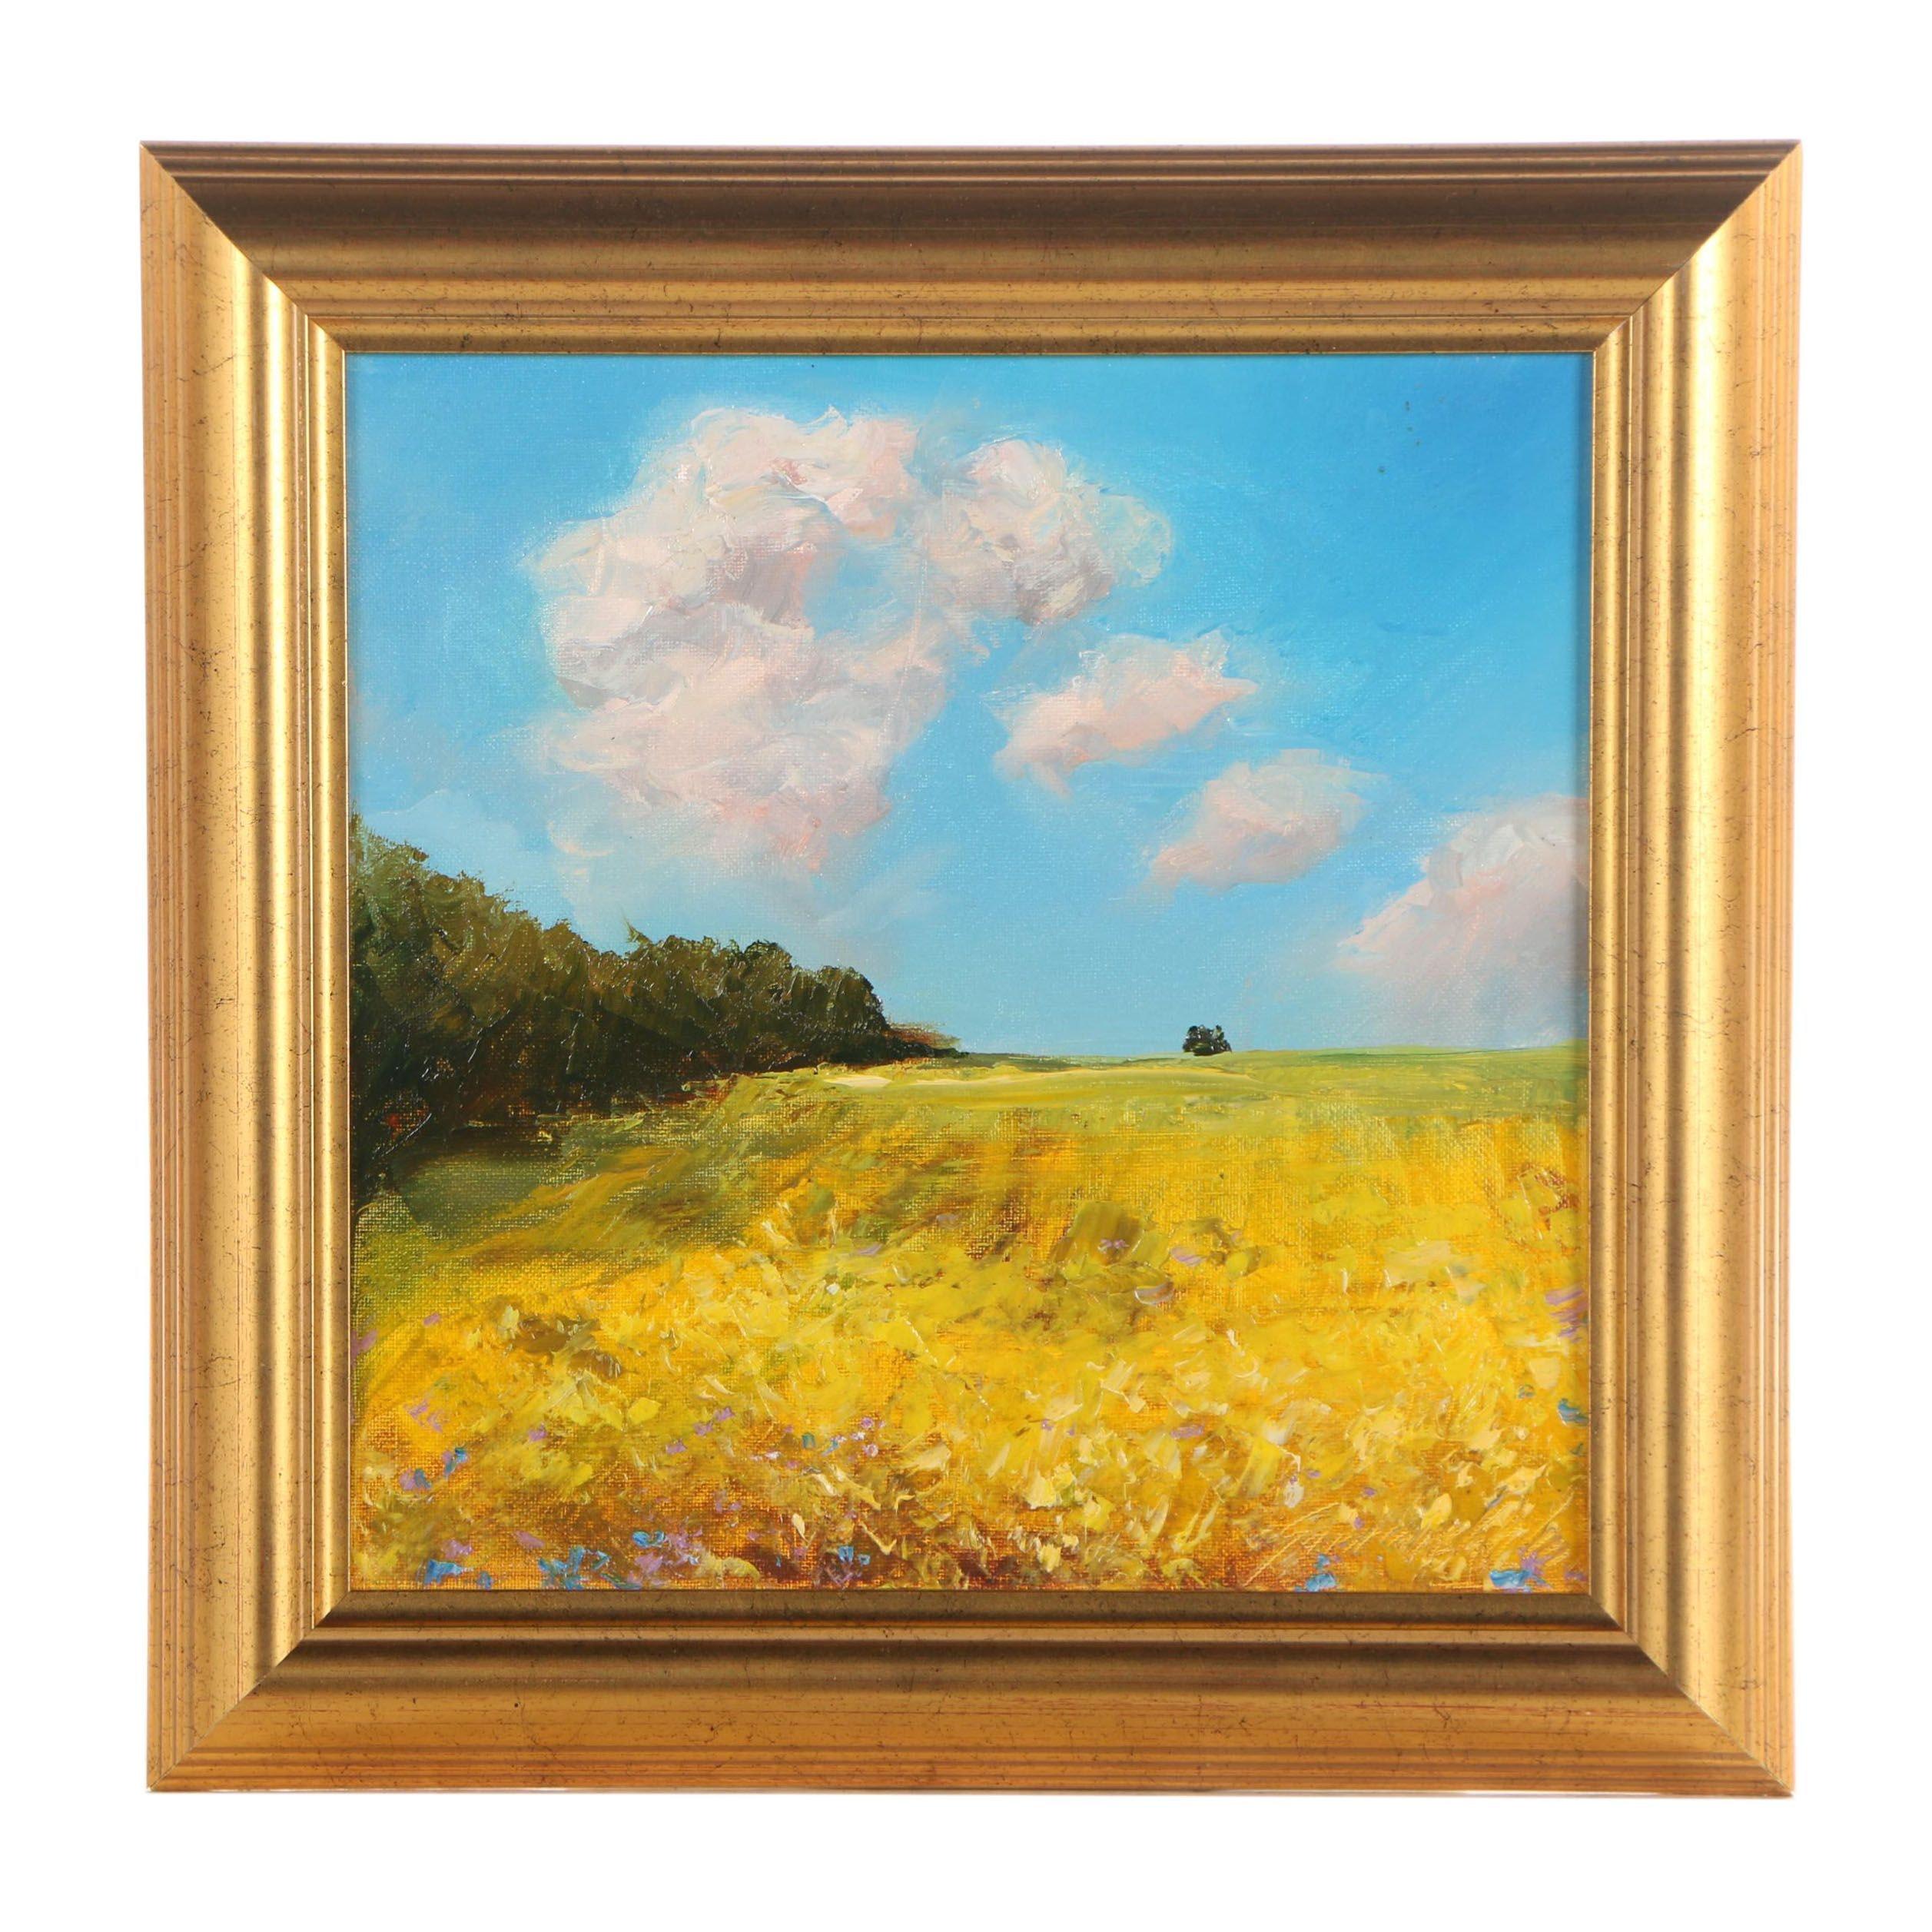 "Aleksander Garncarek Oil Painting "" Nad Polami"" (Over Fields)"